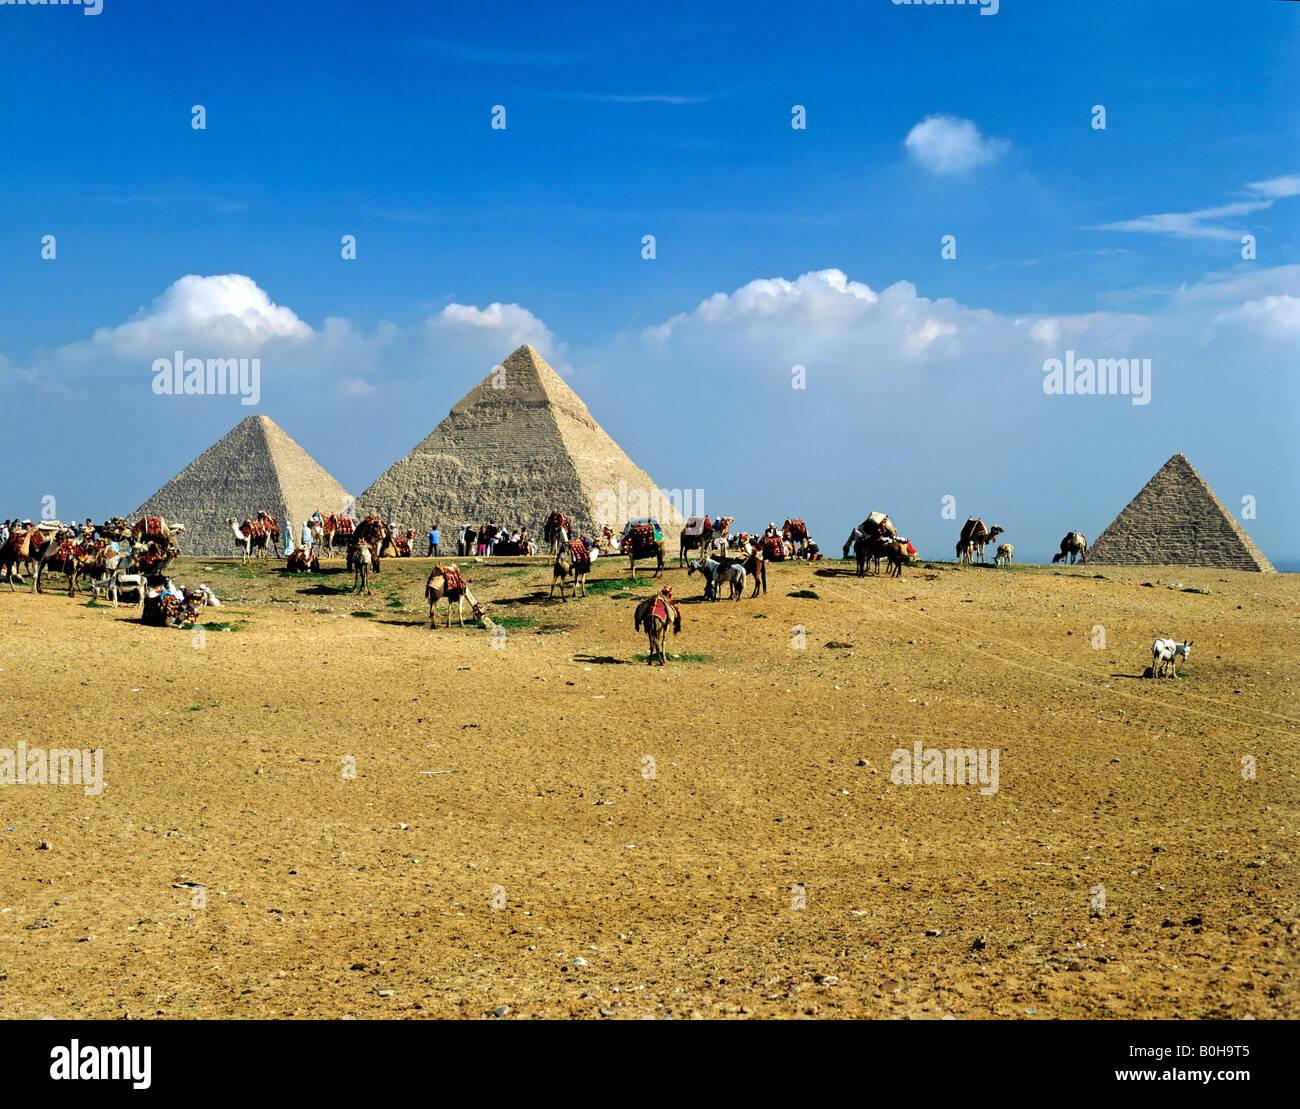 Pyramide de Gizeh, complexes, Menkorah Khufu, Khafra Pyramides, Le Caire, Egypte Photo Stock